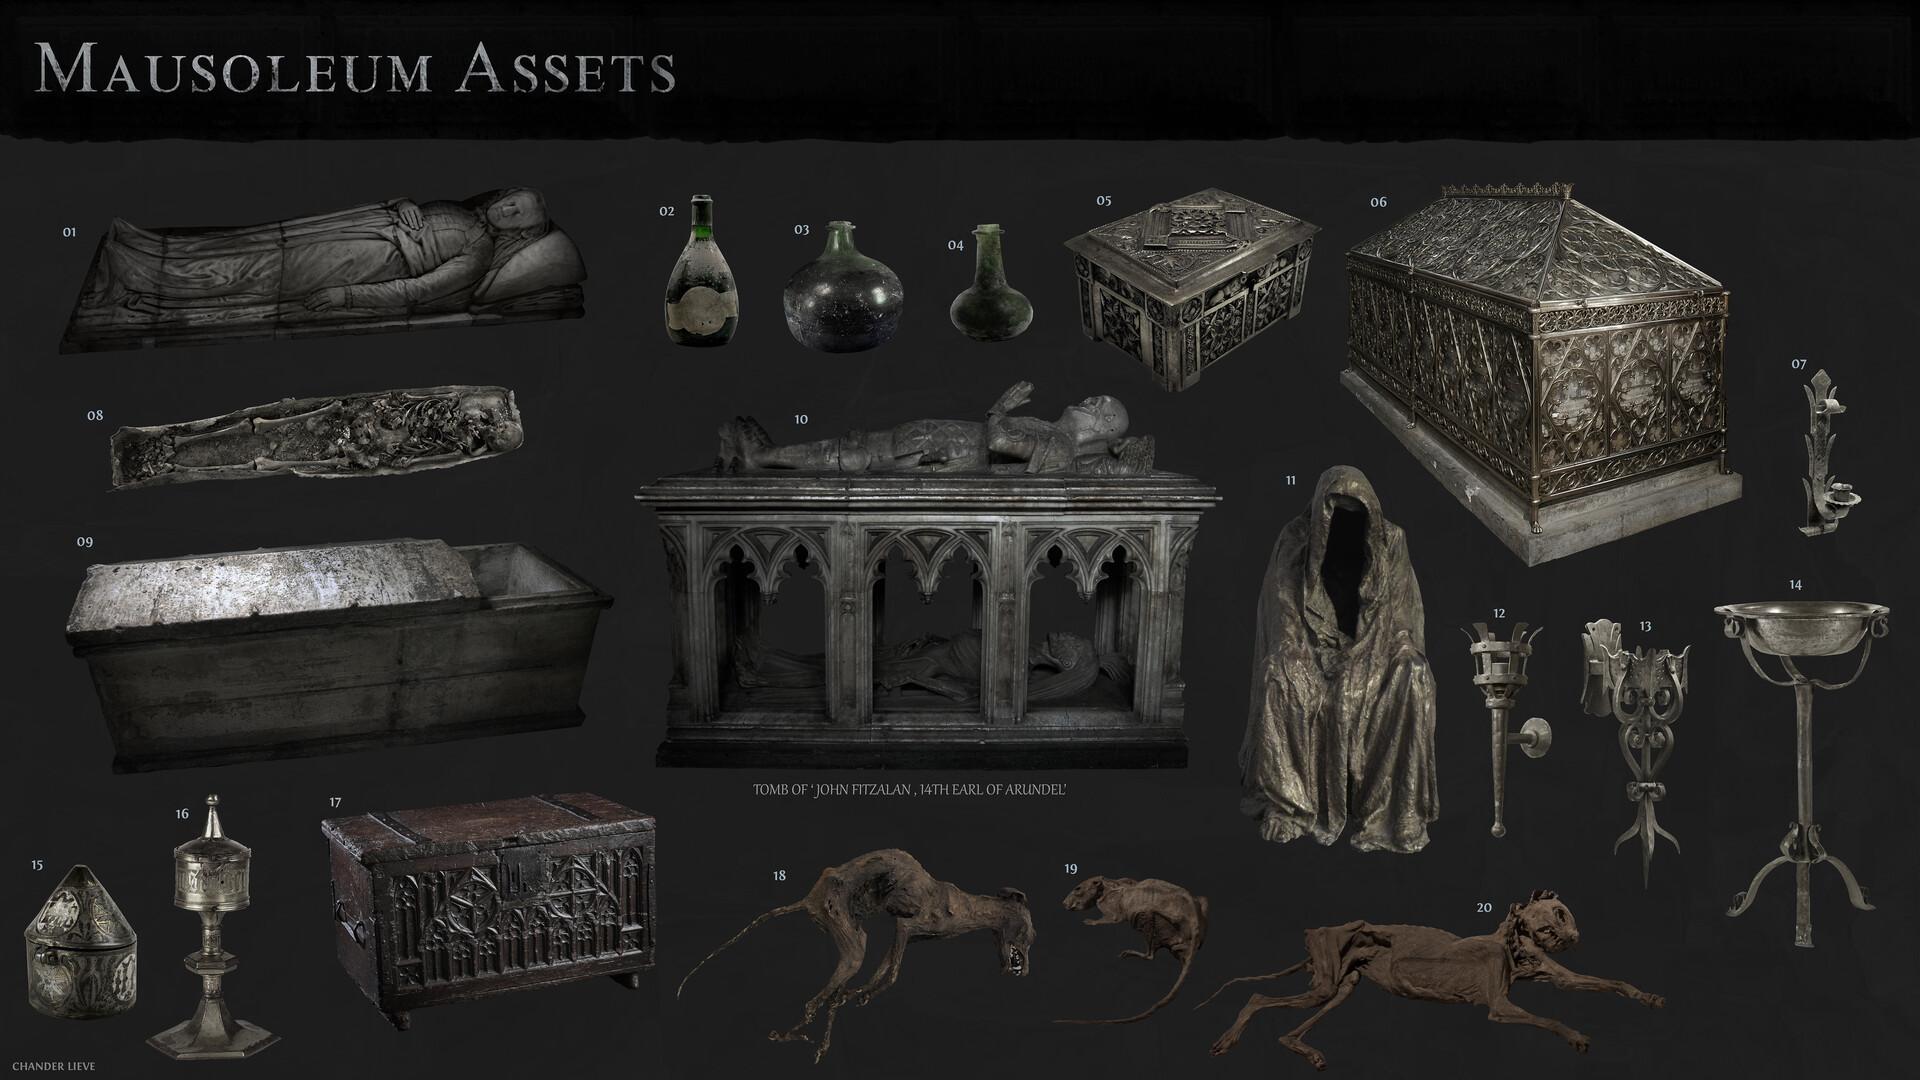 Chander lieve mausoleum assets